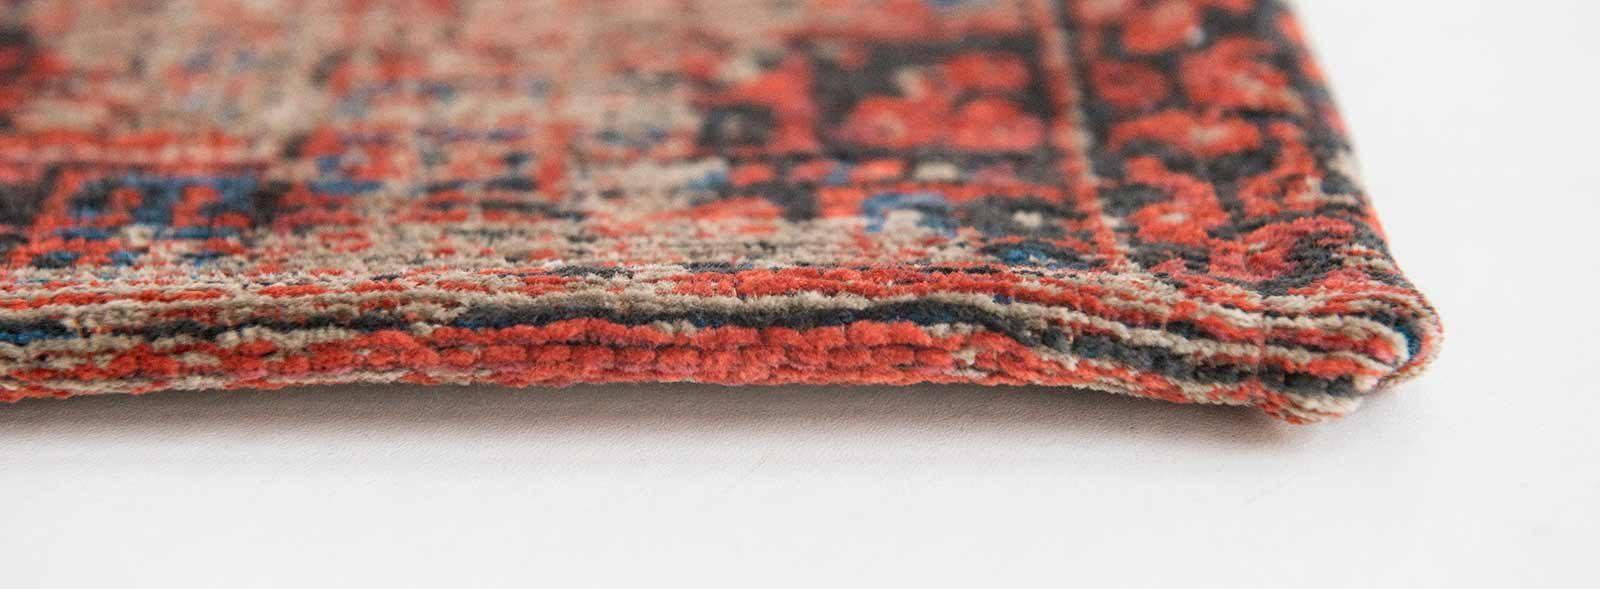 rugs Louis De Poortere LX8719 Antiquarian Antique Hadschlu 782 Red side